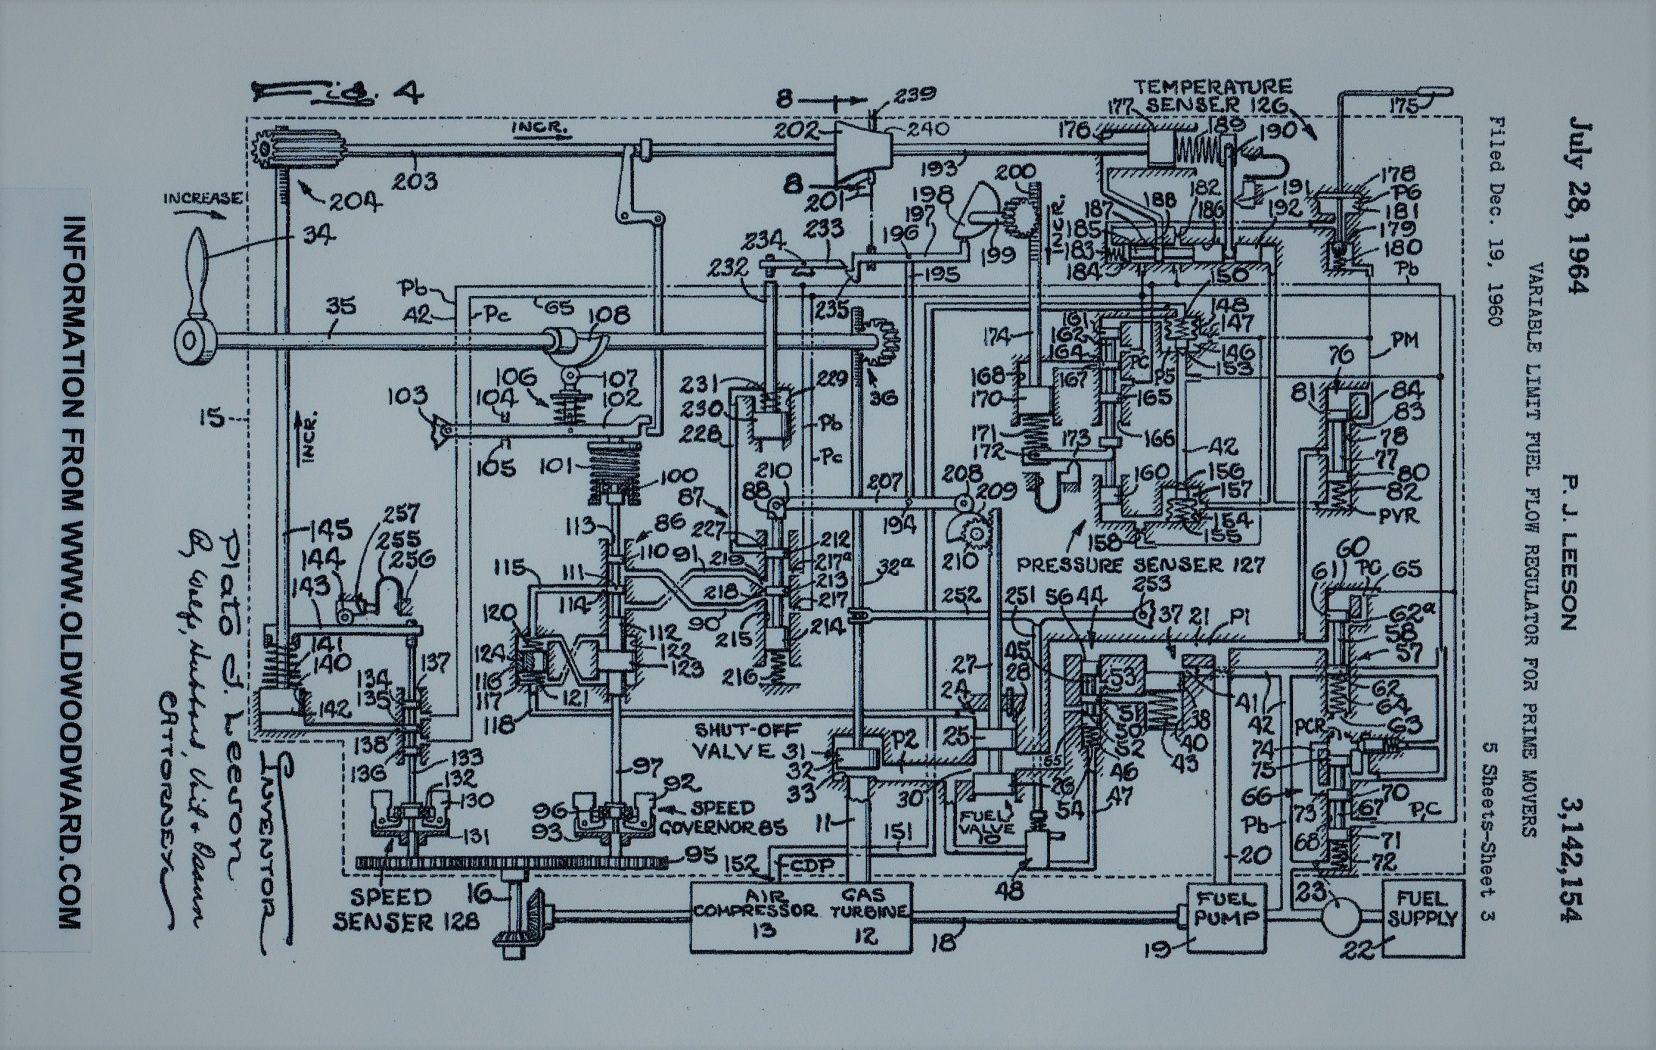 oldwoodward com jet engine fuel control schematic history drawing rh pinterest com rc jet engine schematic jet engine schematic diagrams